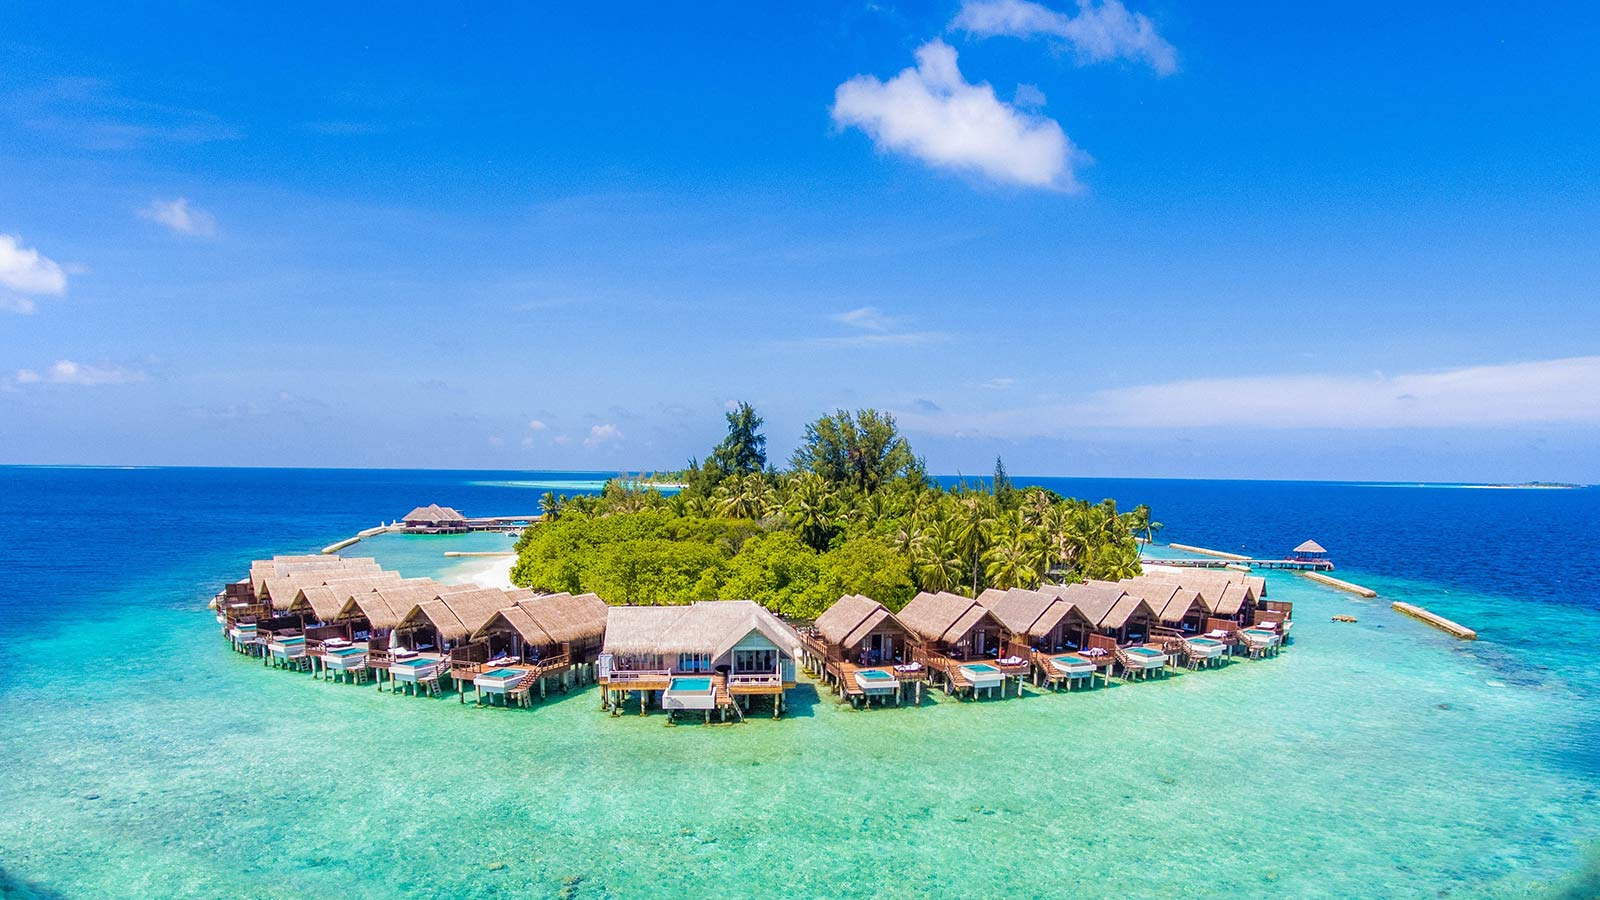 Maldives Luxury Resort